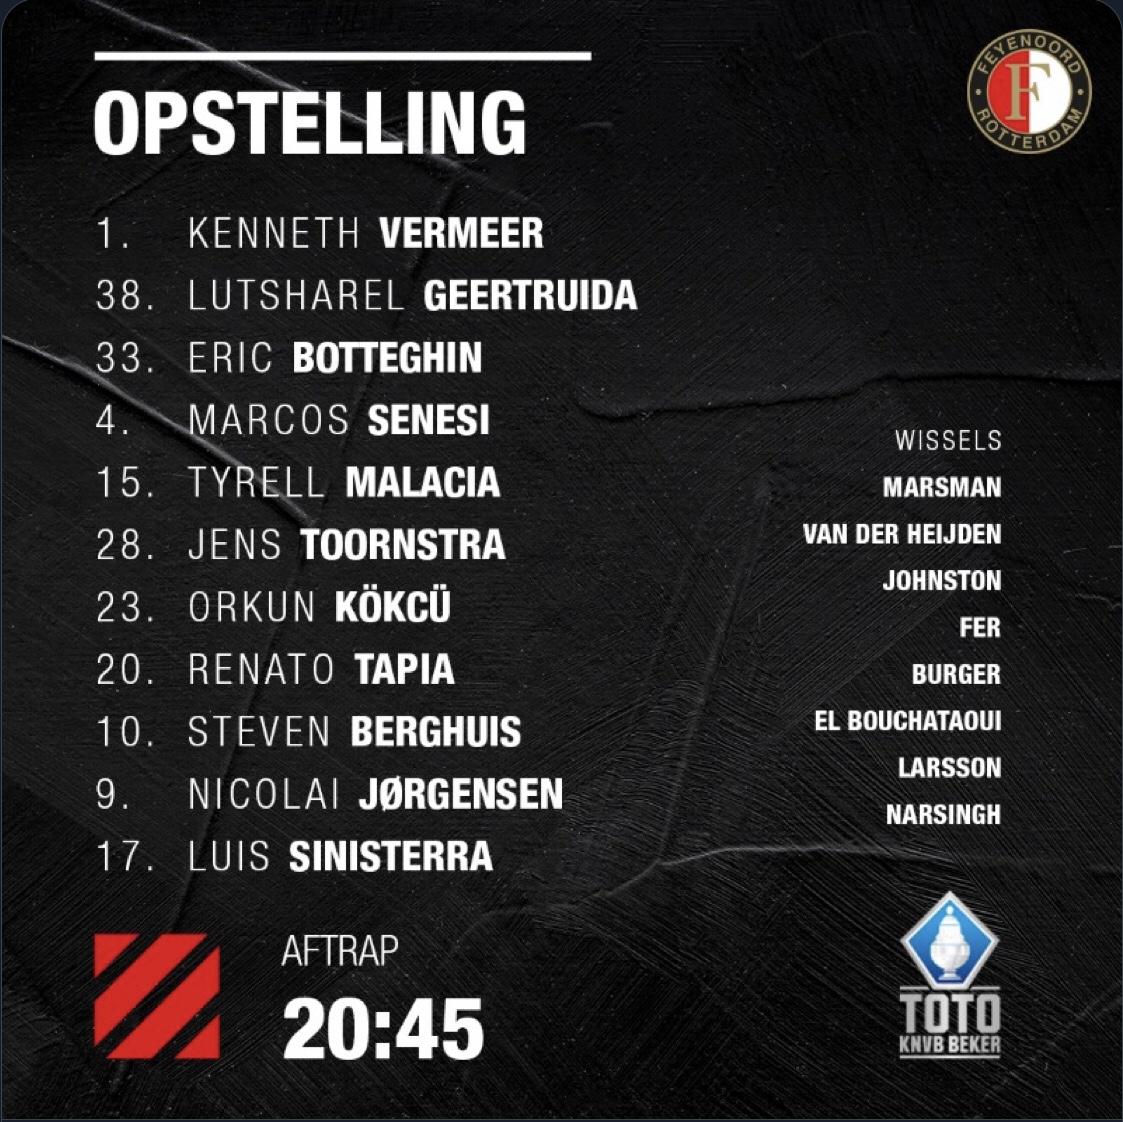 Opstelling Feyenoord Met Tapia Tegen Cambuur Leeuwarden Feyenoord In Beeld